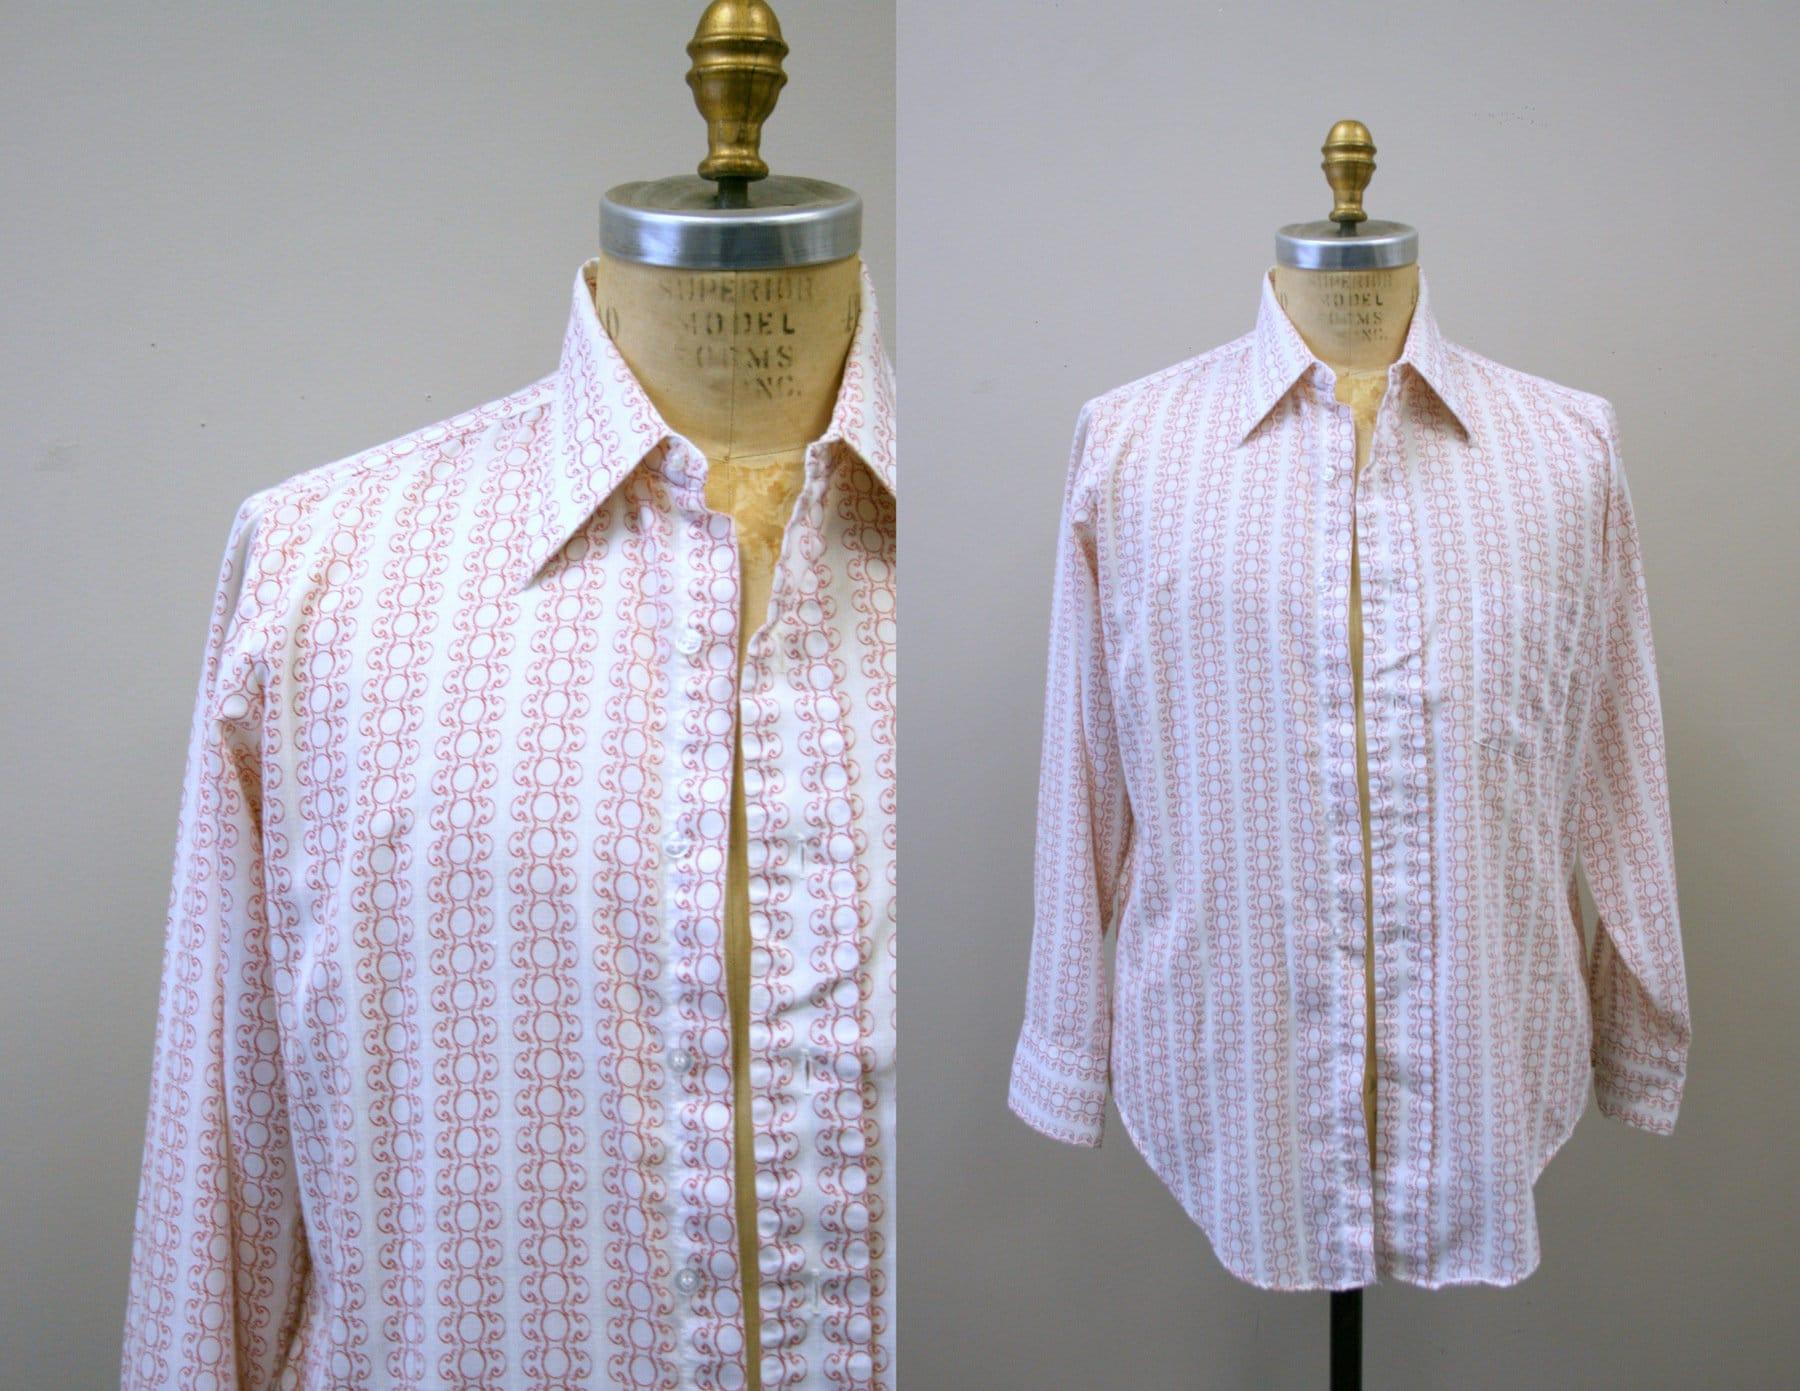 1970s Men's Shirt Styles – Vintage 70s Shirts for Guys 1970S Mens Red  White Printed Shirt $24.00 AT vintagedancer.com